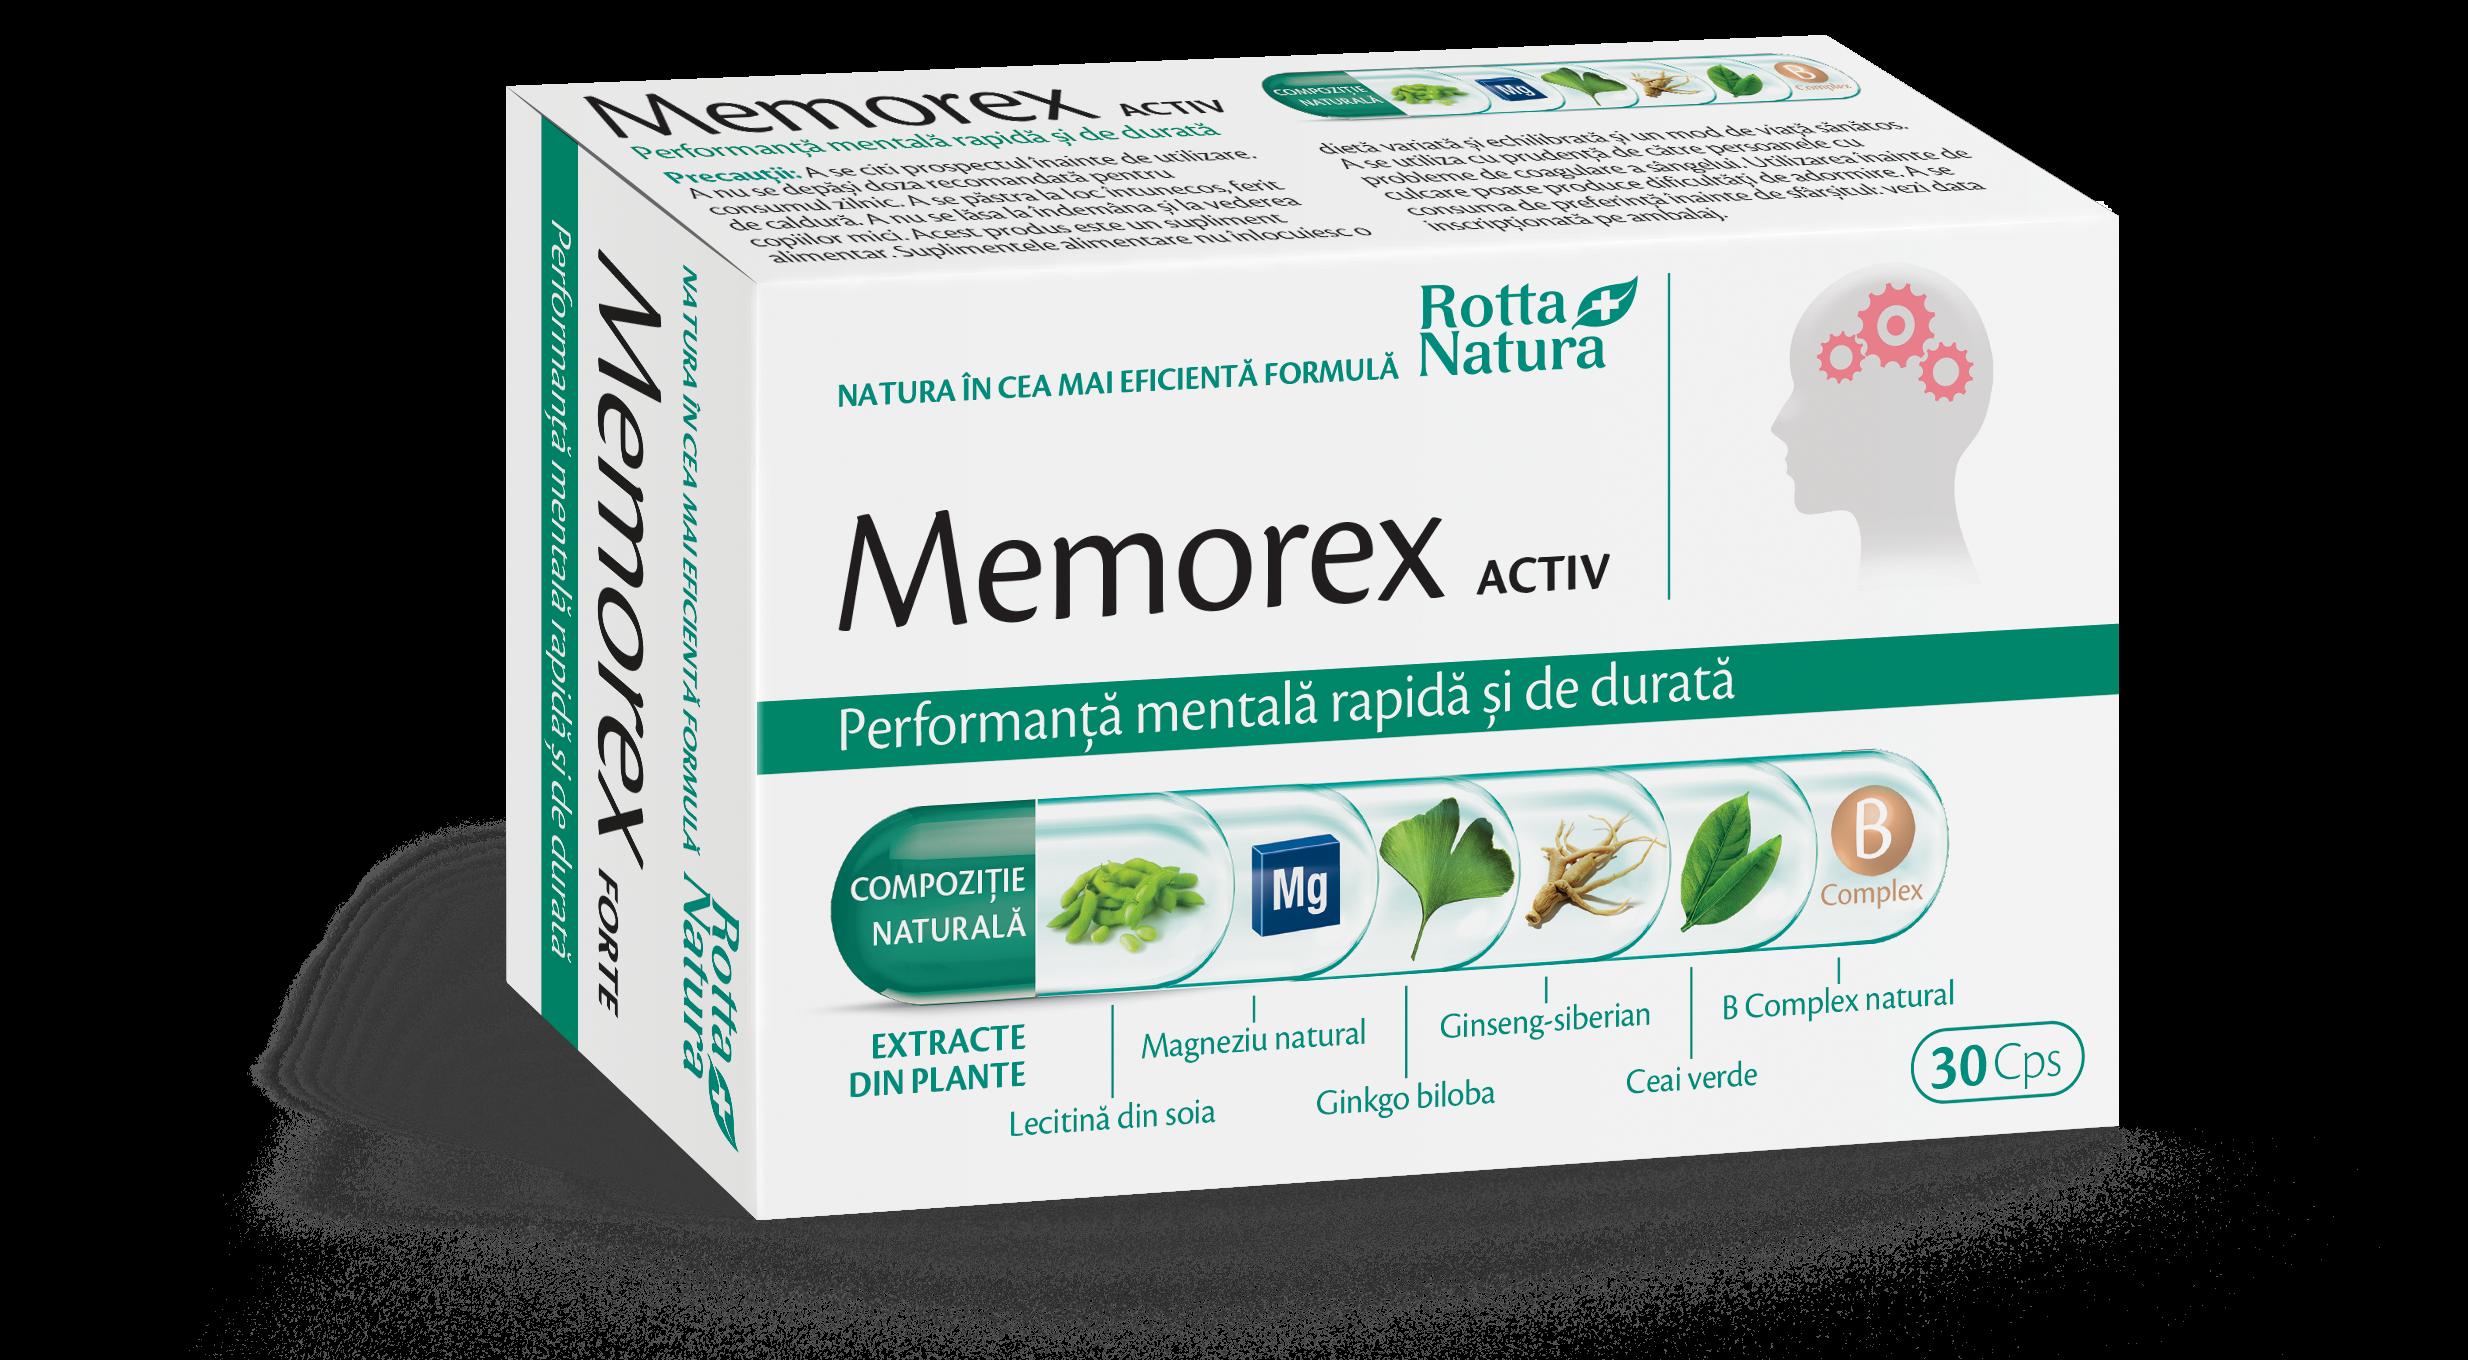 Memorex Activ